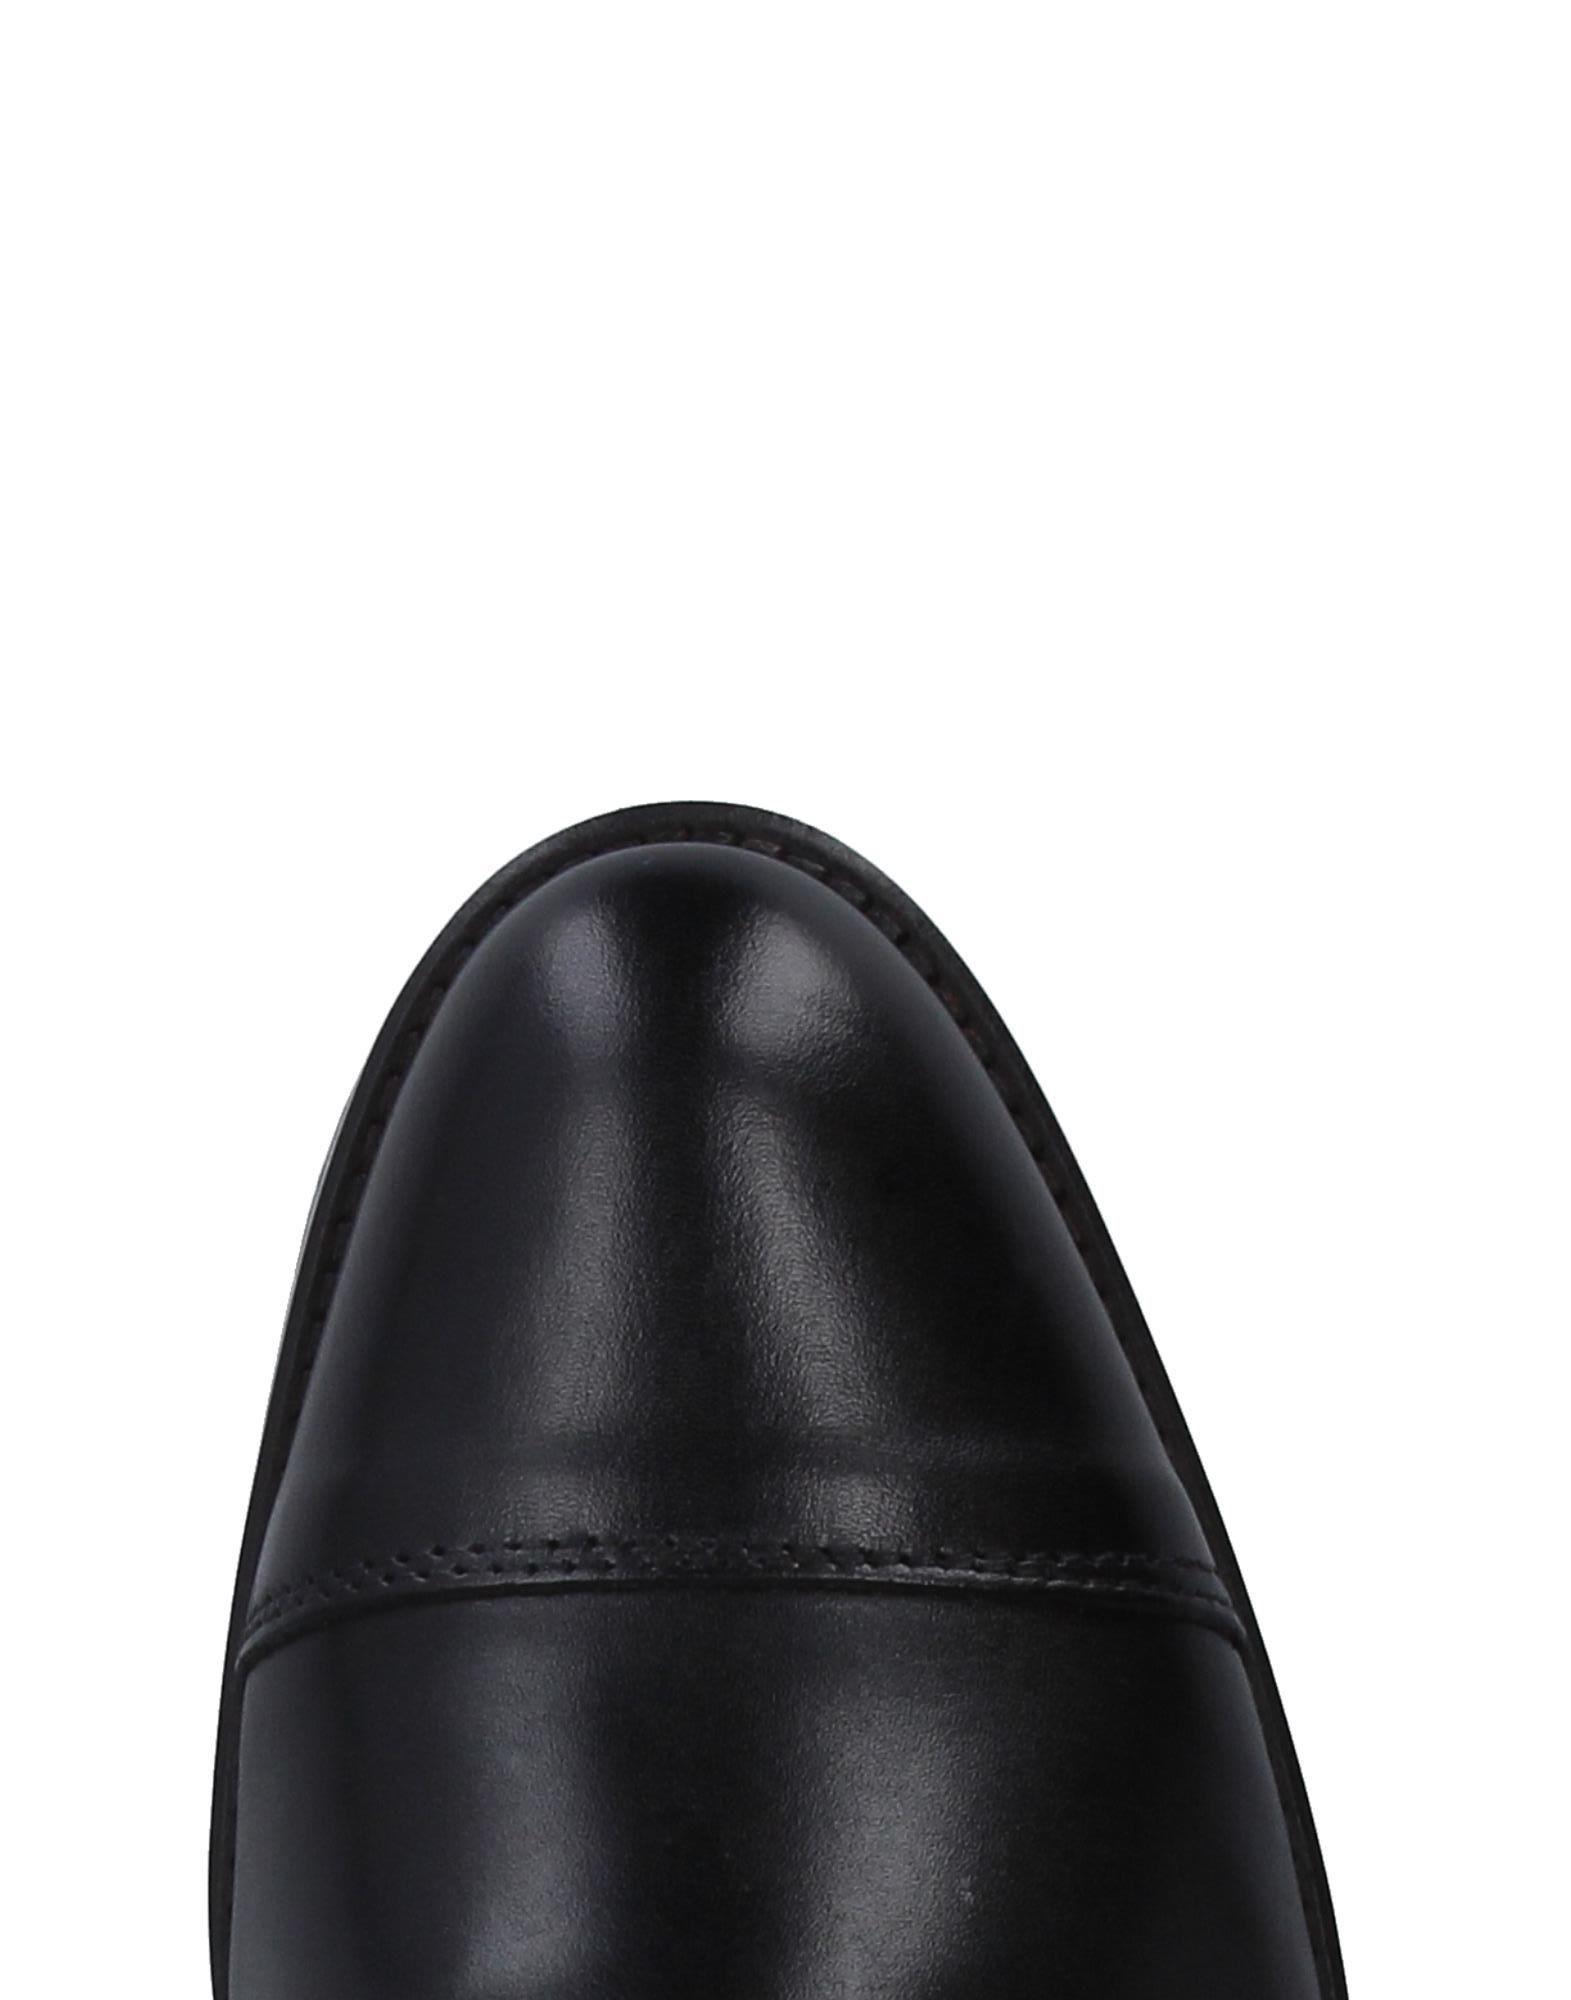 Rabatt echte Schuhe 11291670GF Brawn's Schnürschuhe Herren  11291670GF Schuhe 491a12